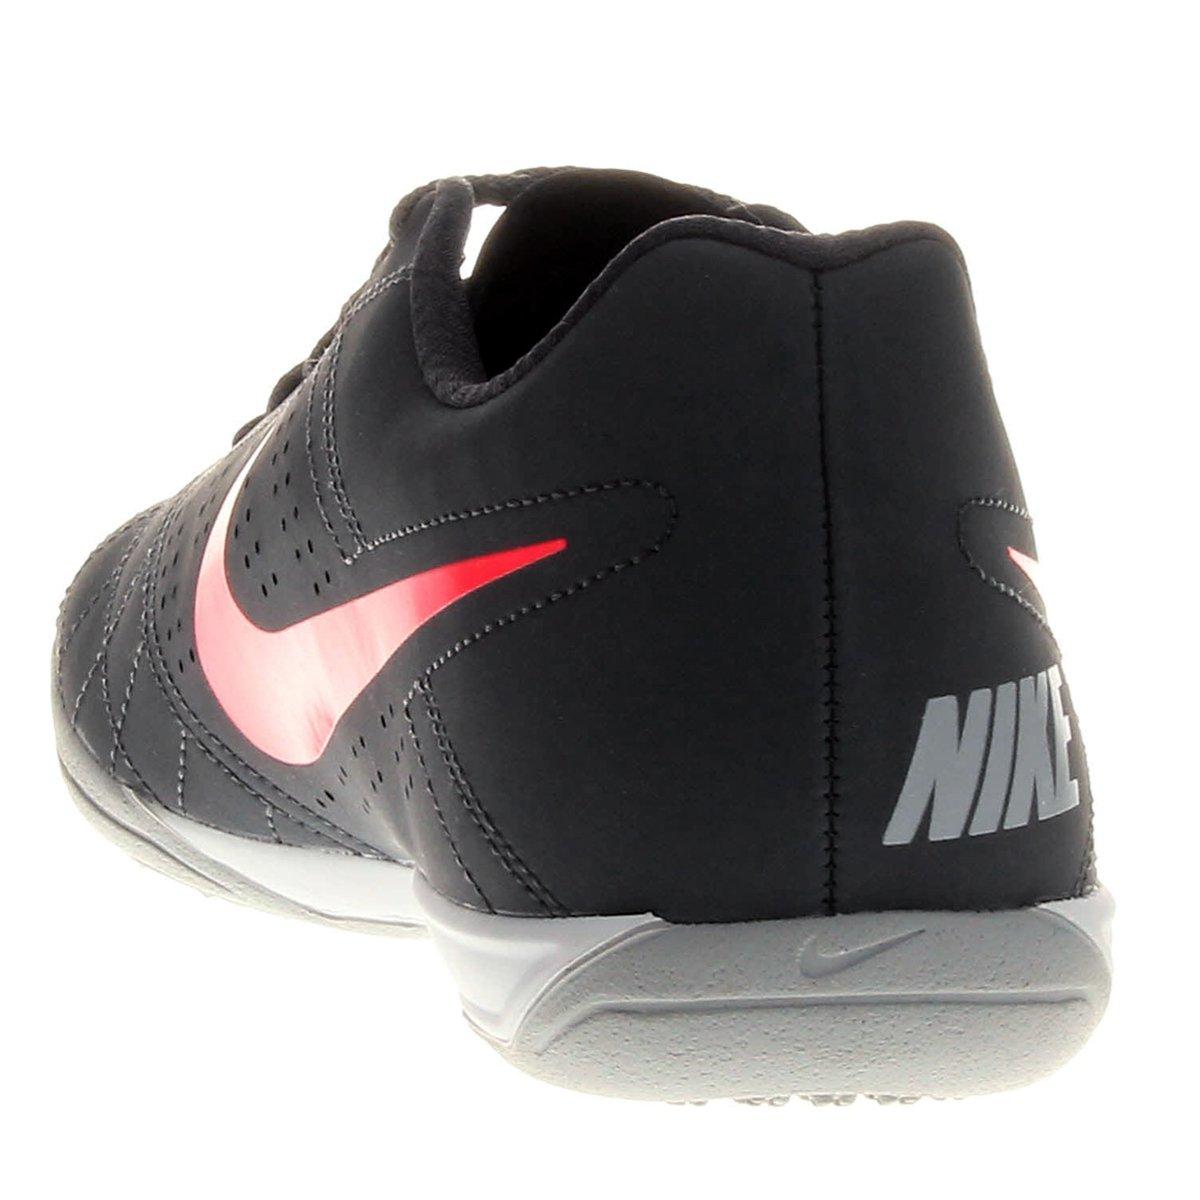 f767fd76de Chuteira Futsal Nike Beco 2 Futsal - Chumbo e Rosa - Compre Agora ...